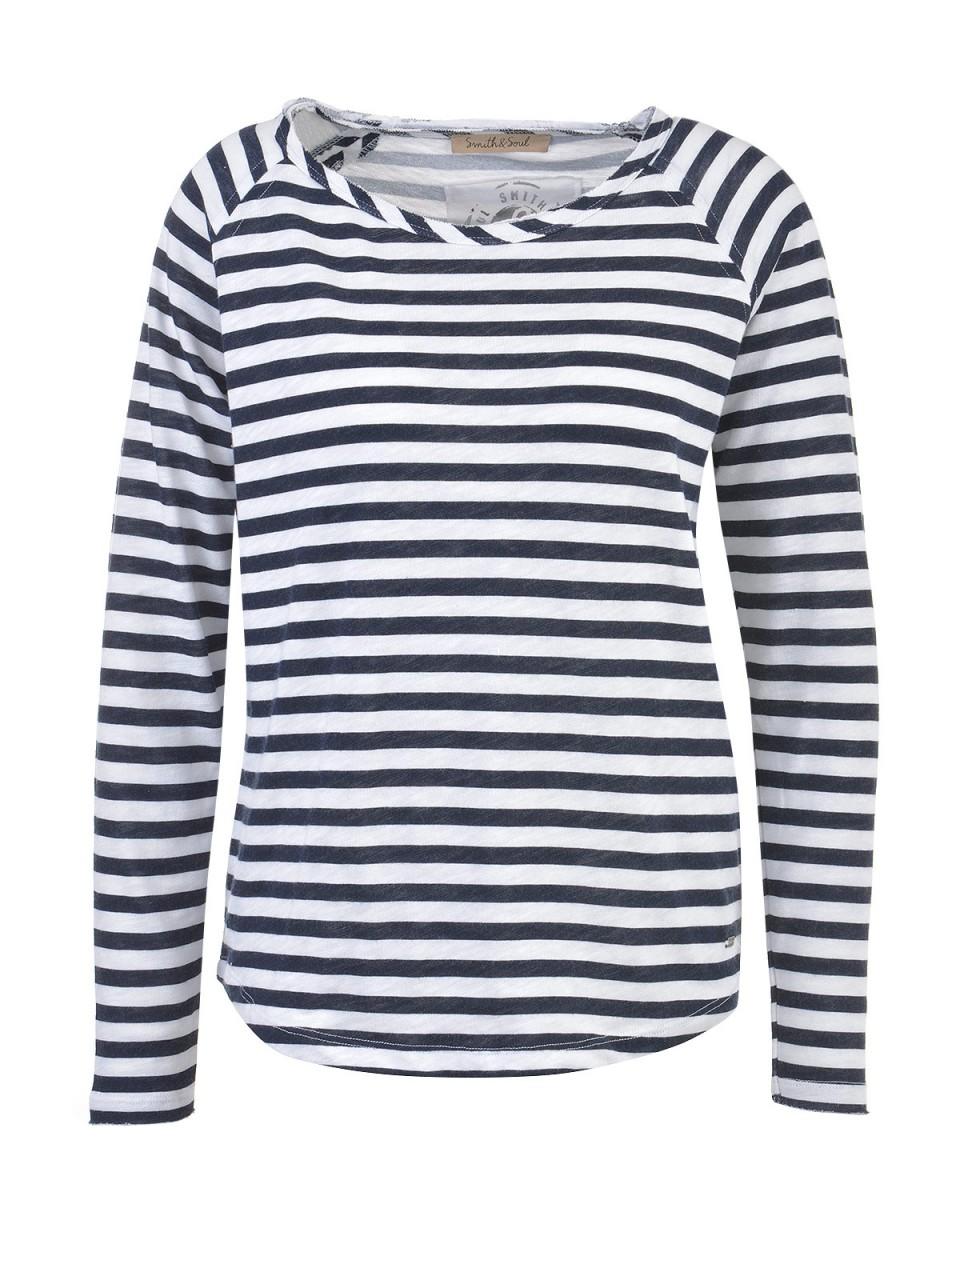 smith-amp-soul-damen-shirt-navy-wei-szlig-